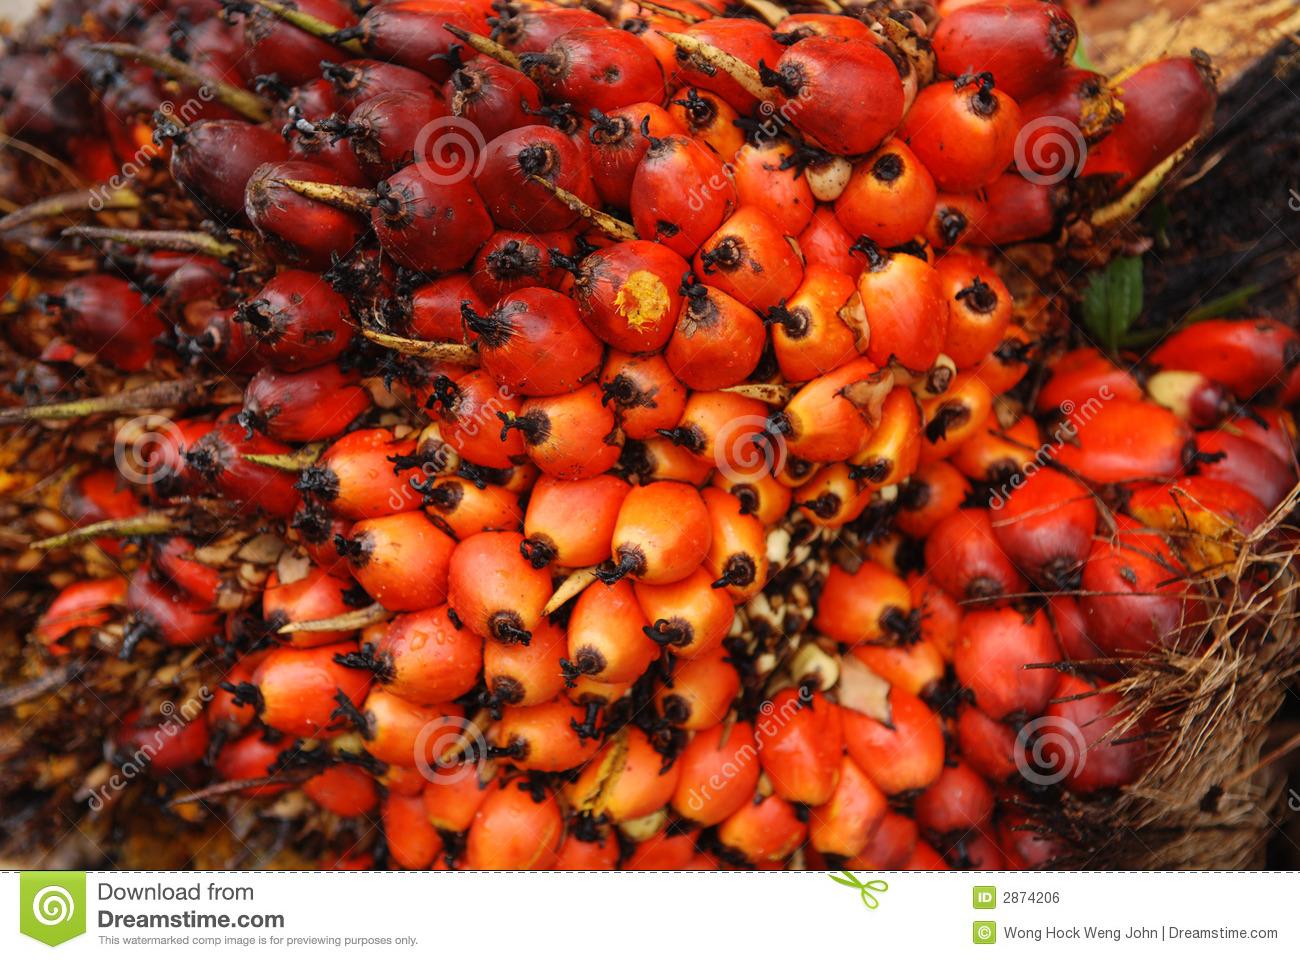 Palm seeds clipart #17